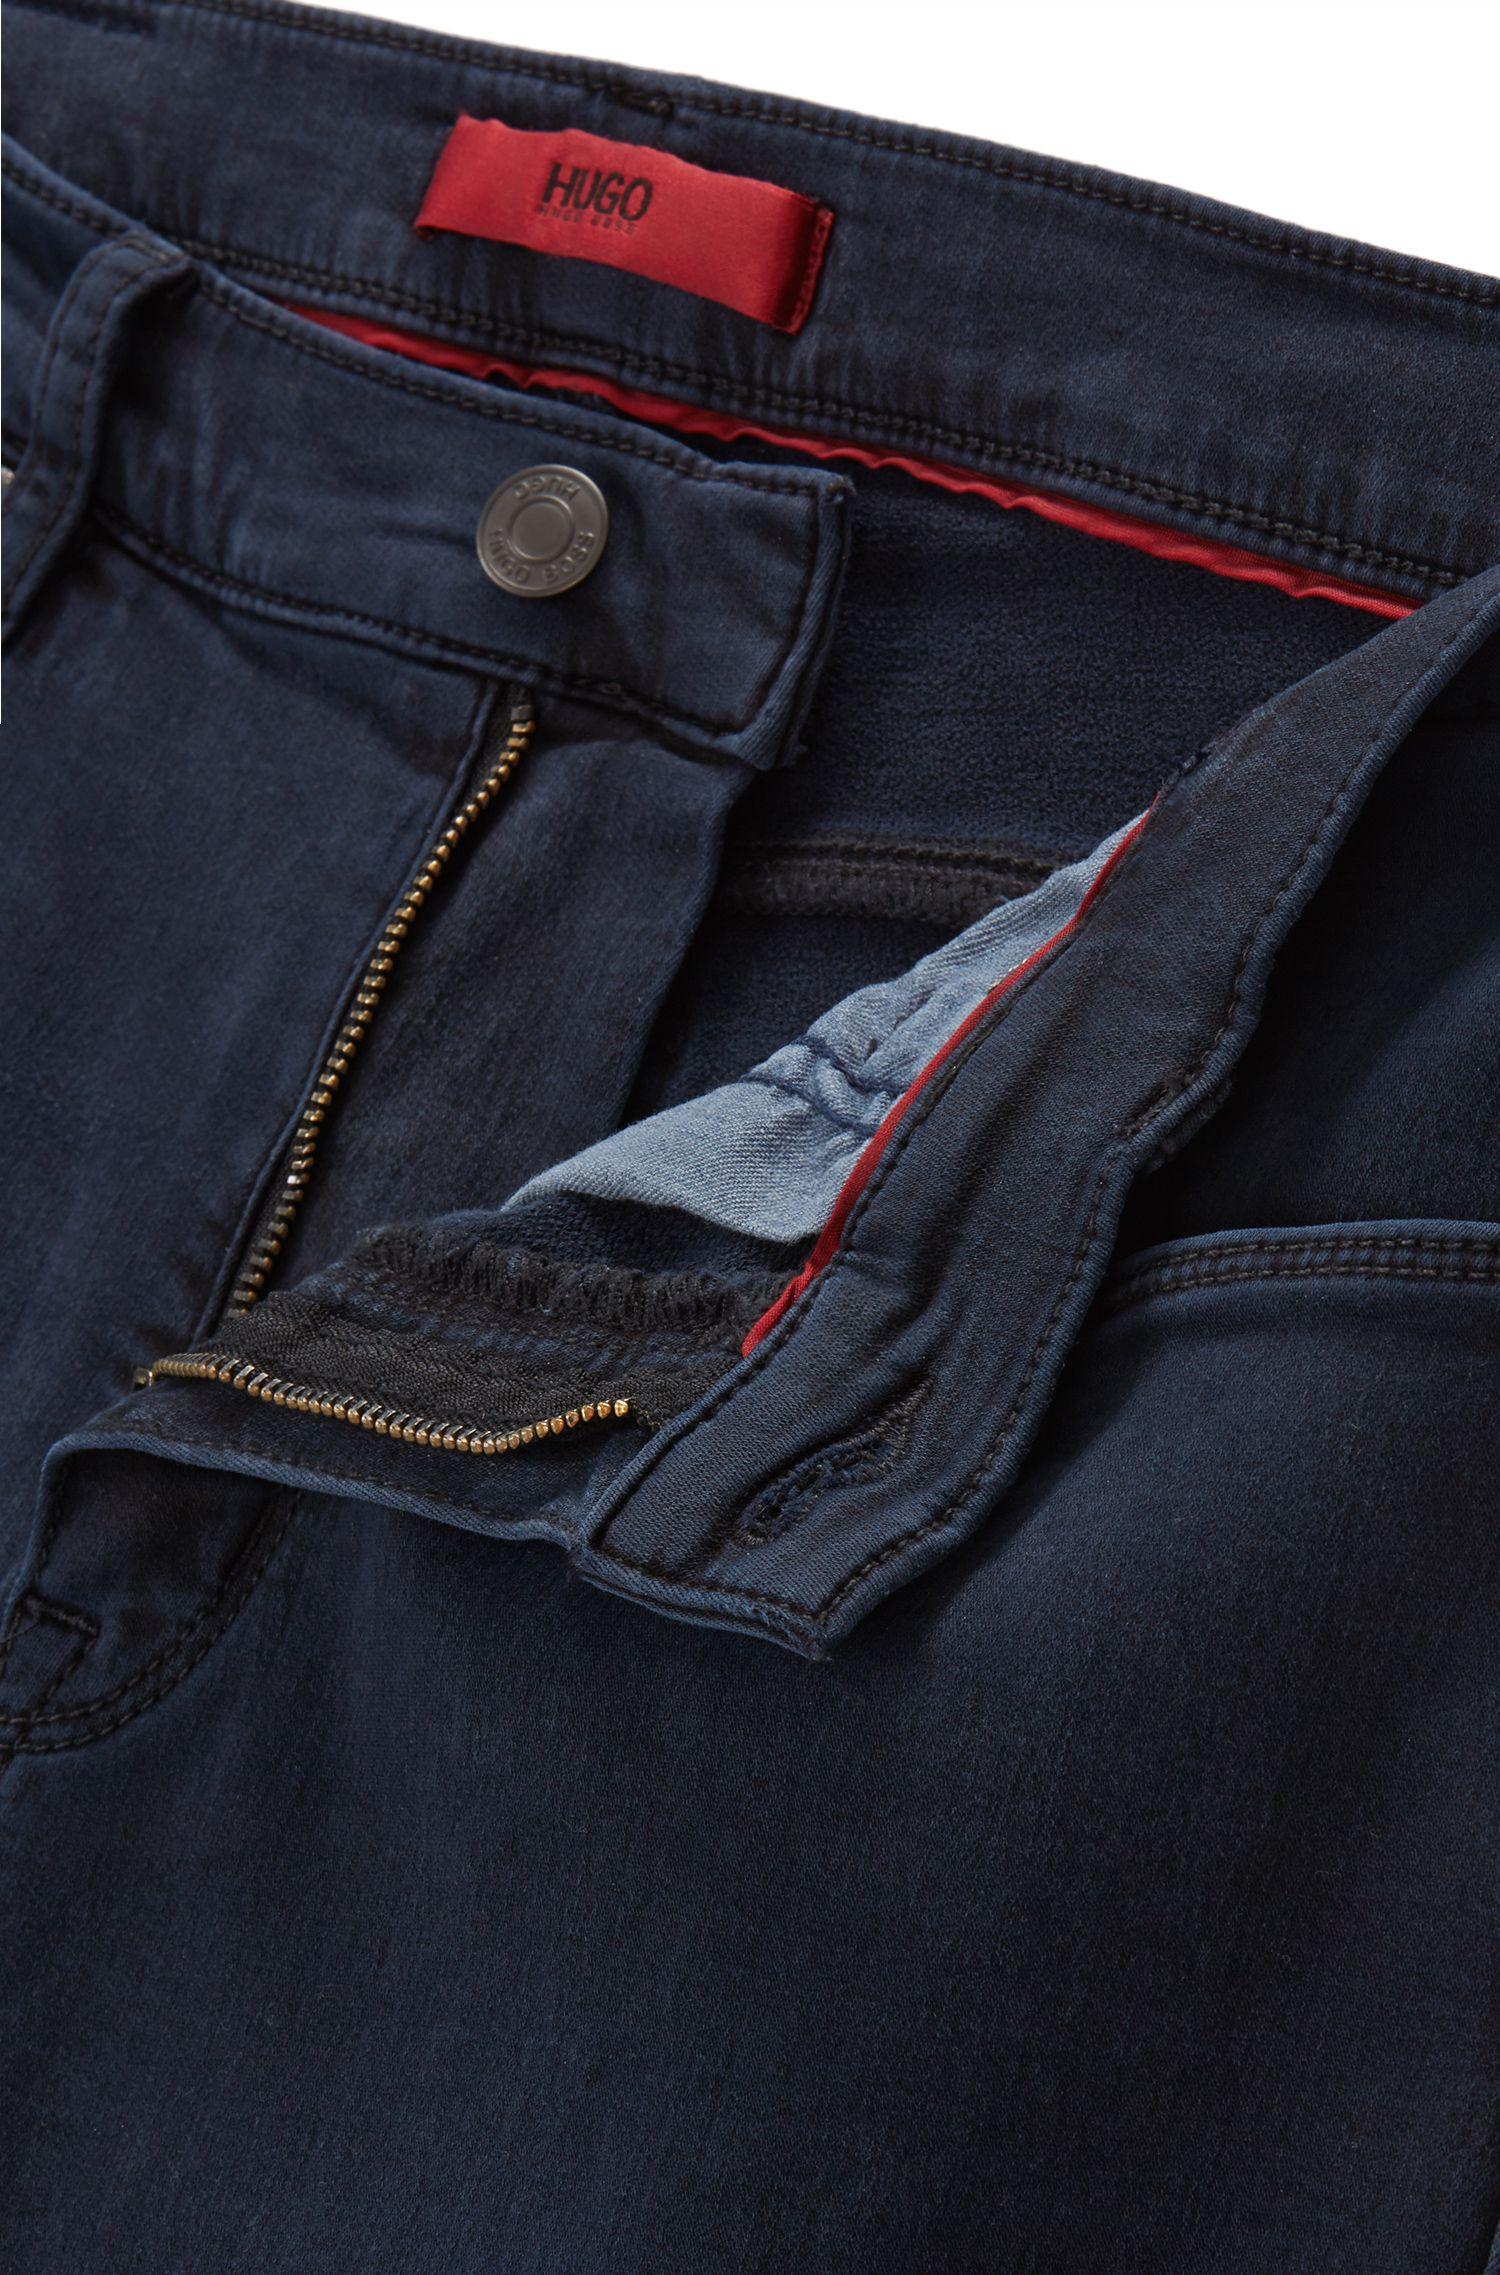 9.5 oz Stretch Cotton Blend Jeans Slim Fit | Hugo 708